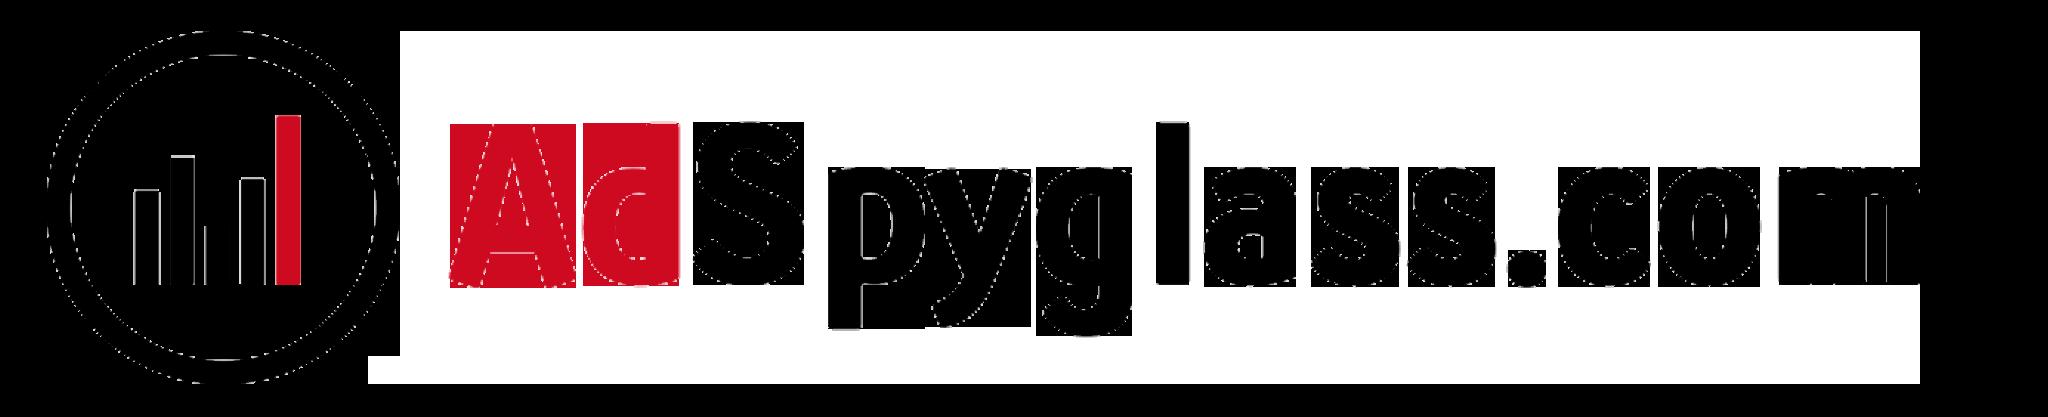 AdSpyglass Mediation System Logo